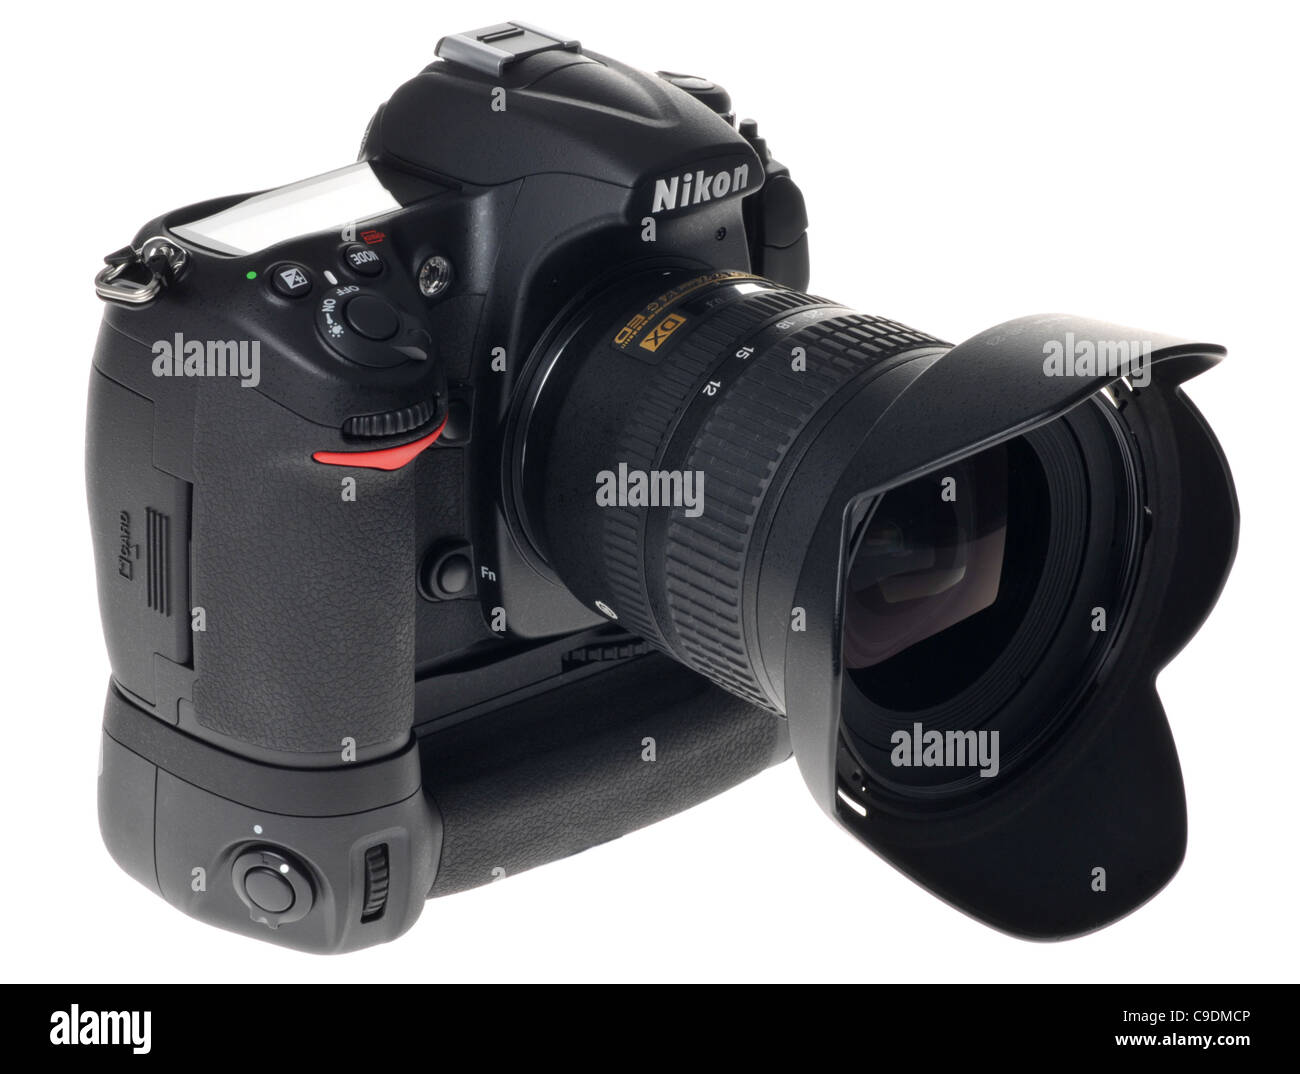 Fotocamera digitale Nikon Immagini Stock